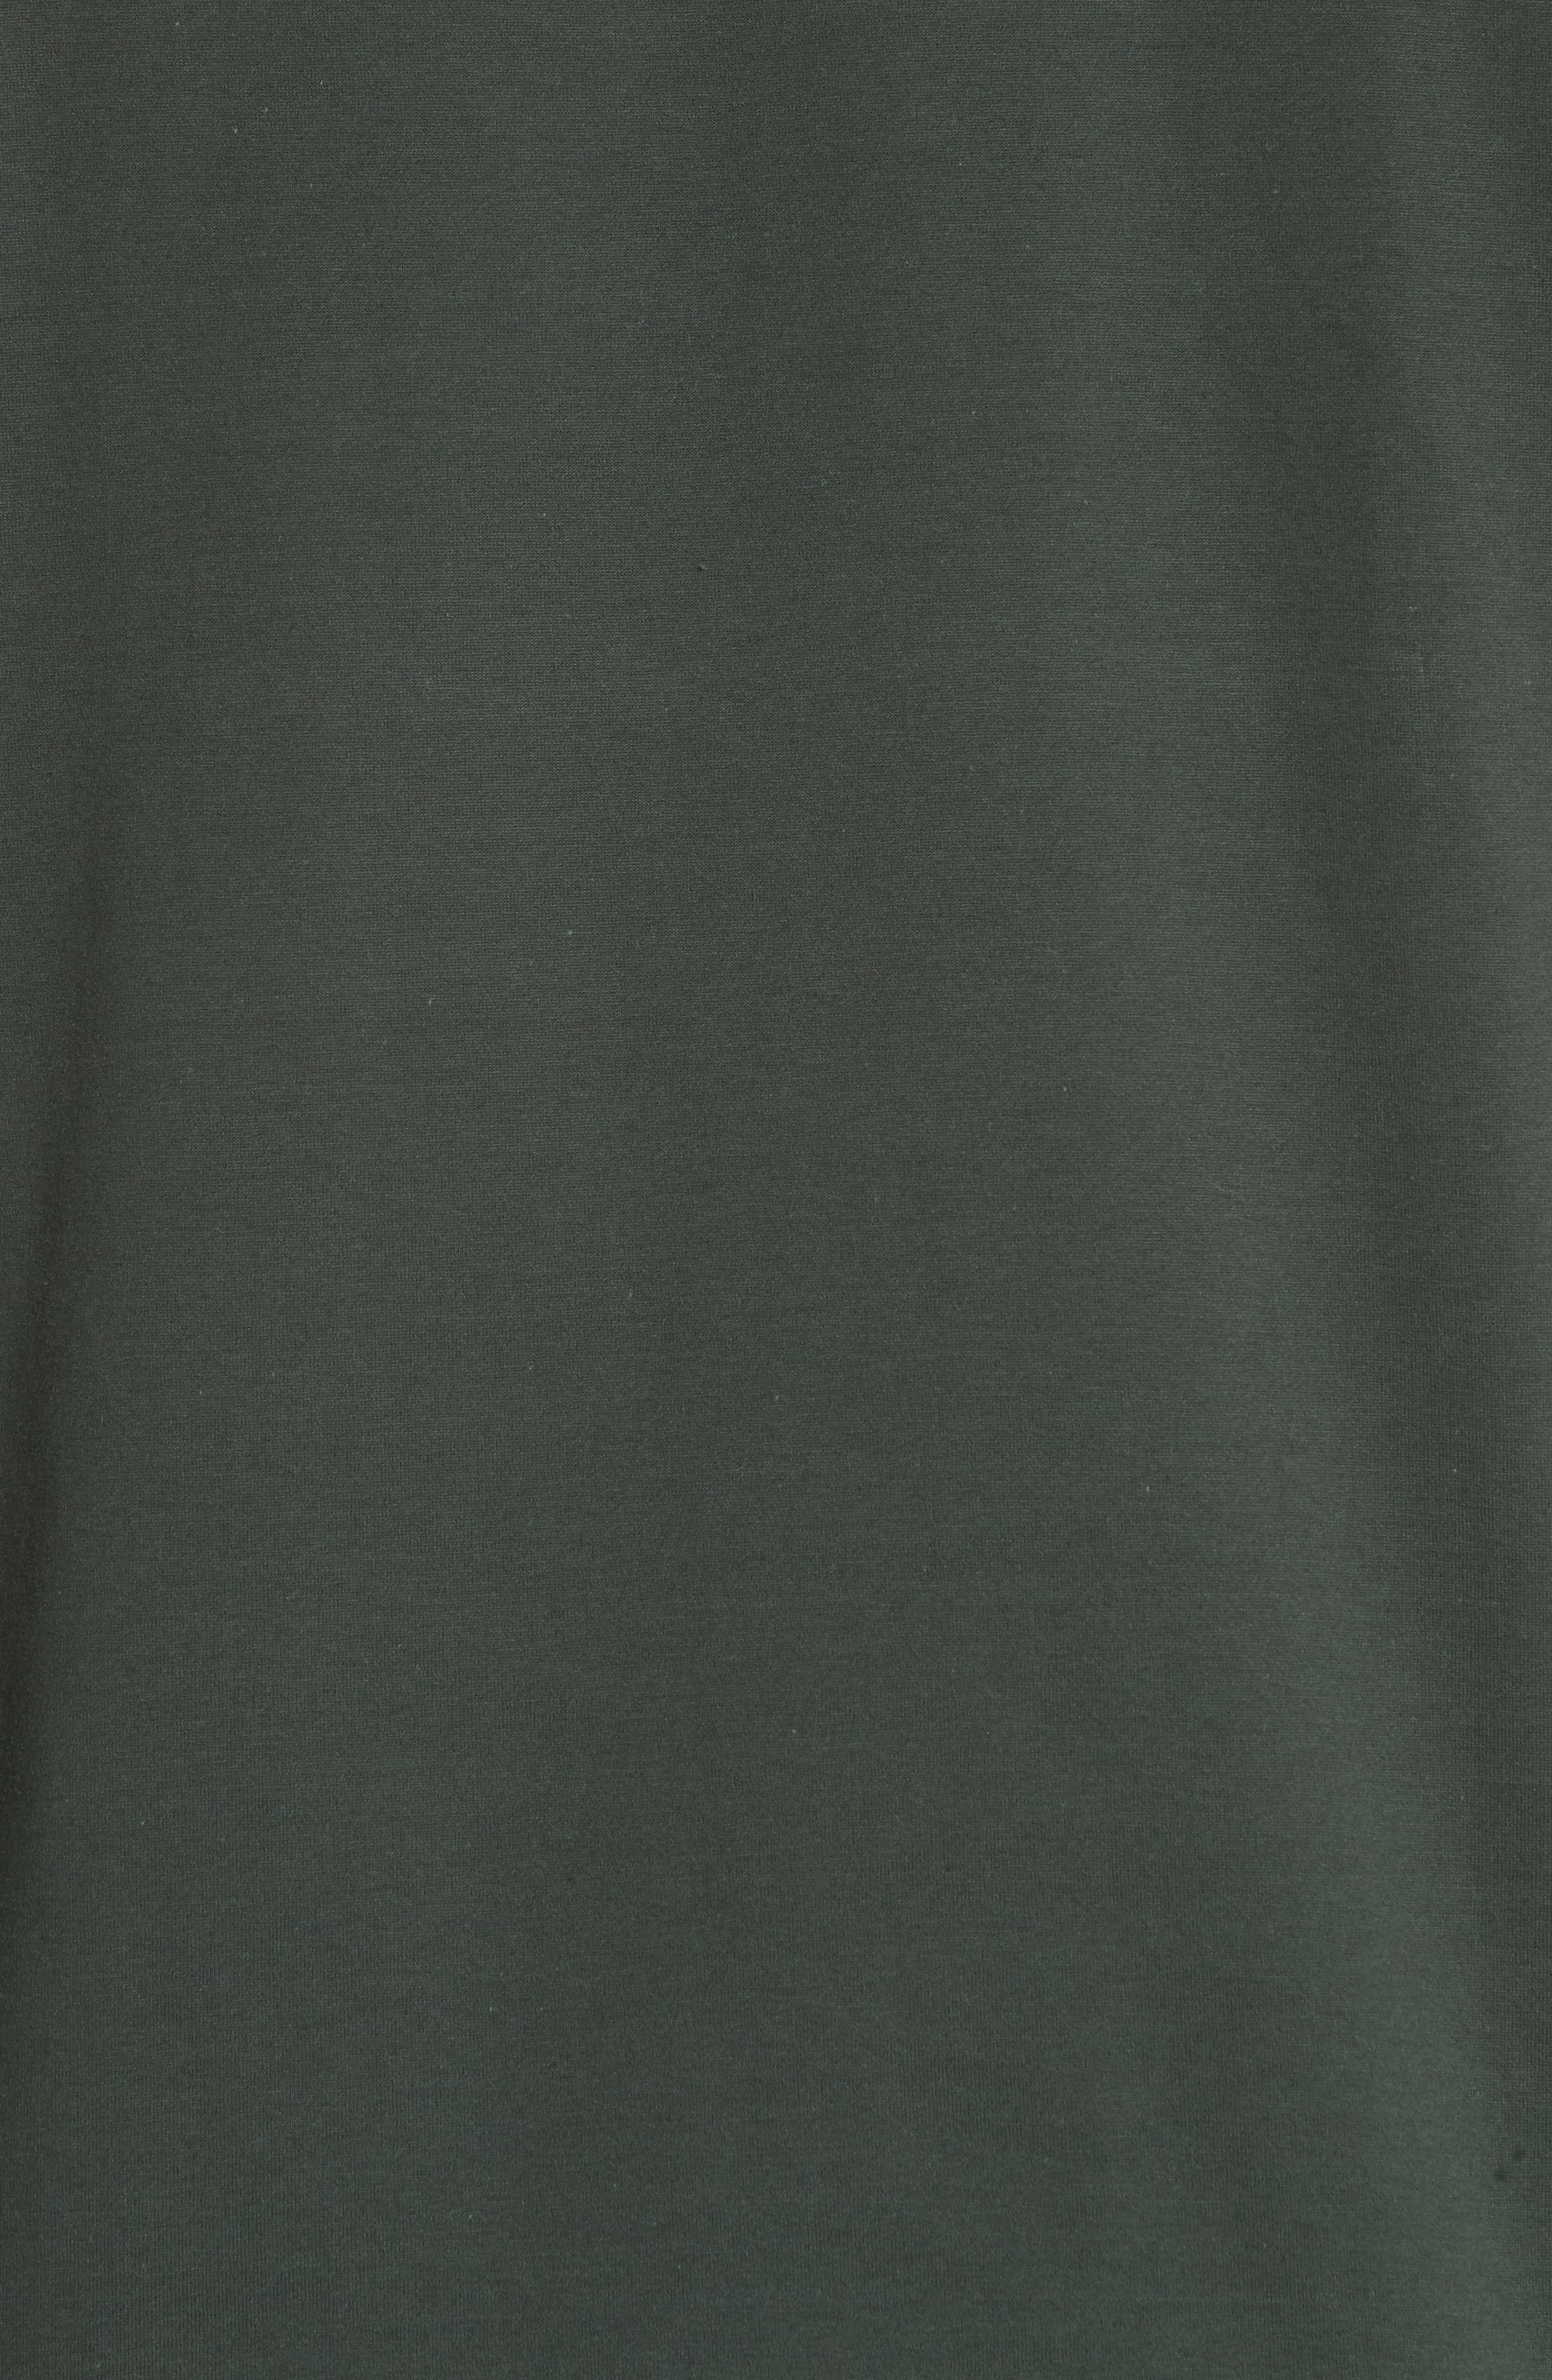 Jersey T-Shirt,                             Alternate thumbnail 5, color,                             300